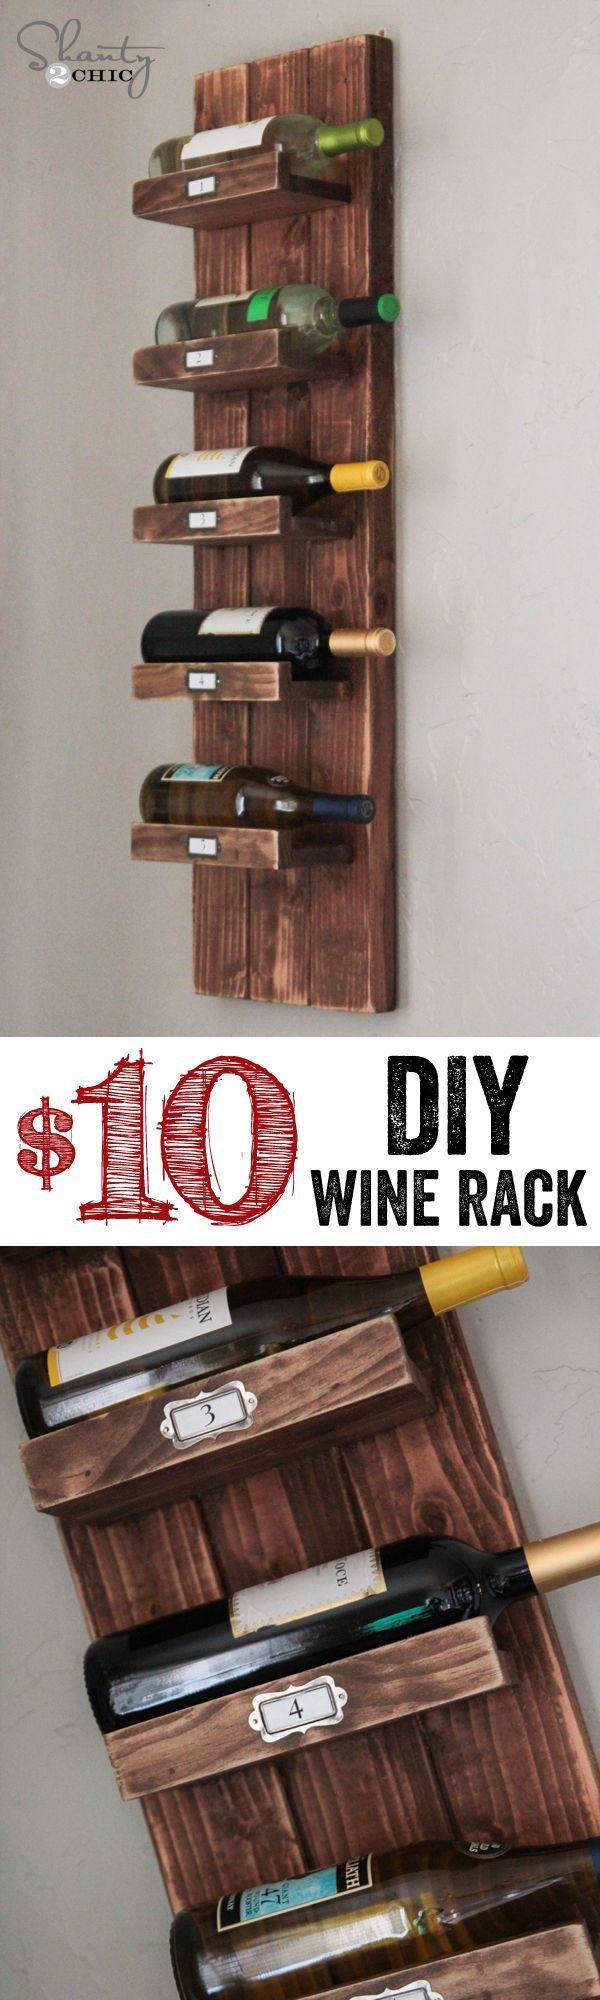 1000 images about wine bottle holders on pinterest wine for Wine bottle shelf diy